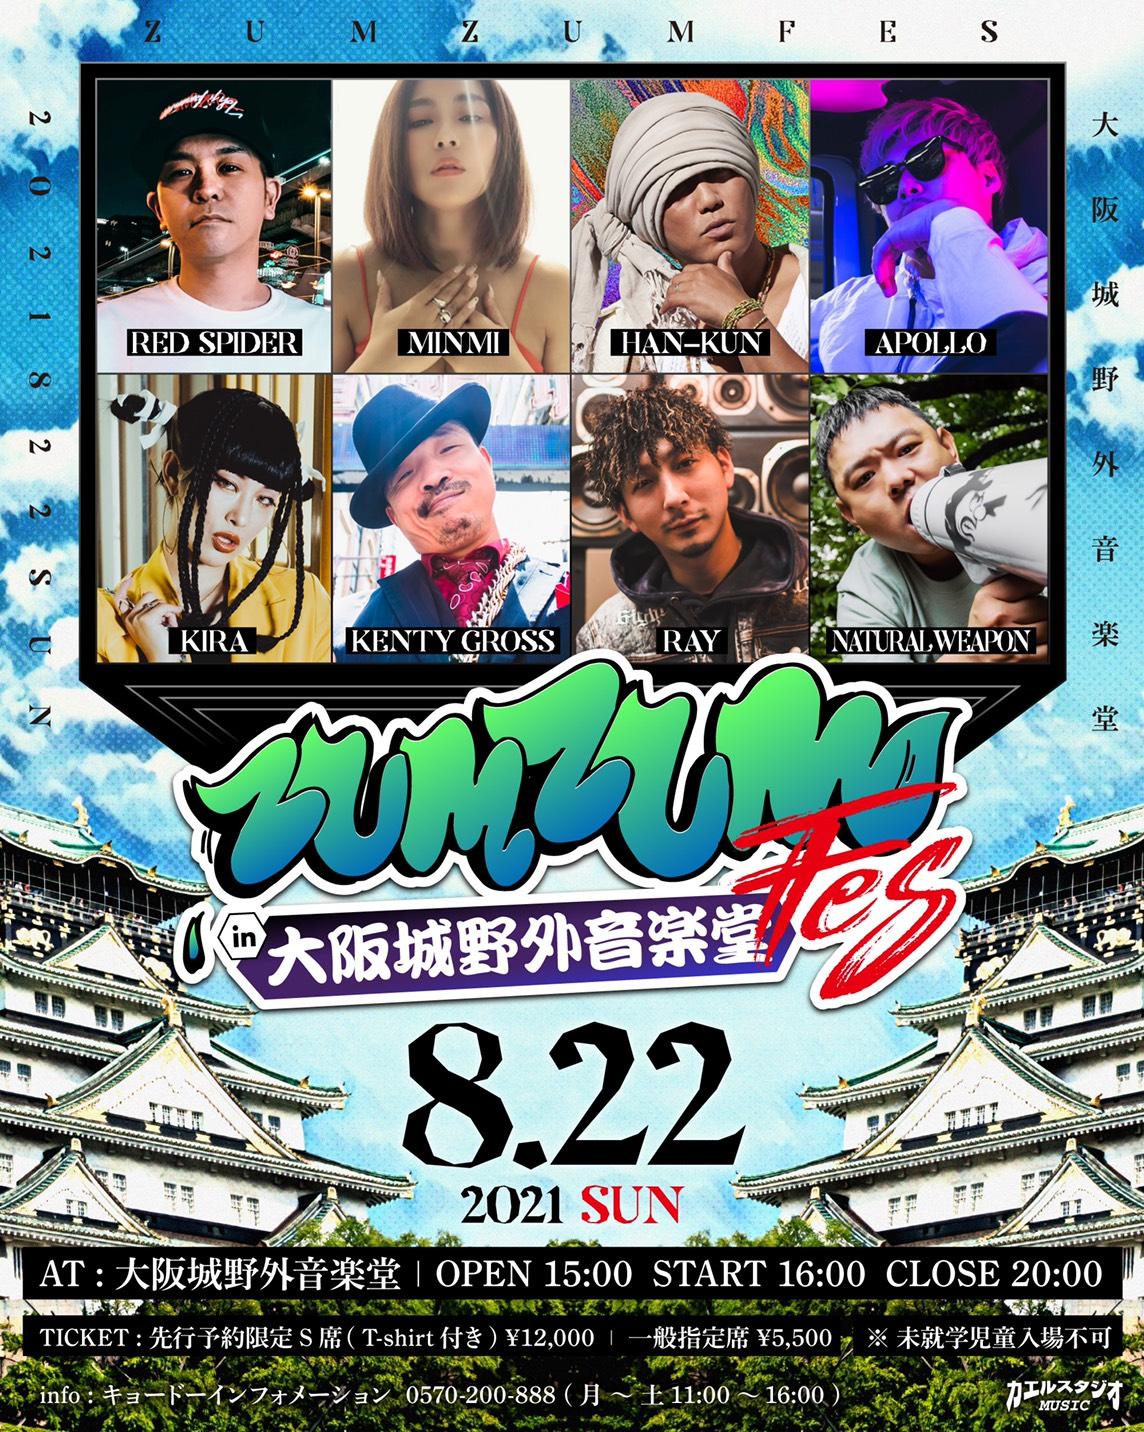 ZUMZUM FES in 大阪城野外音楽堂